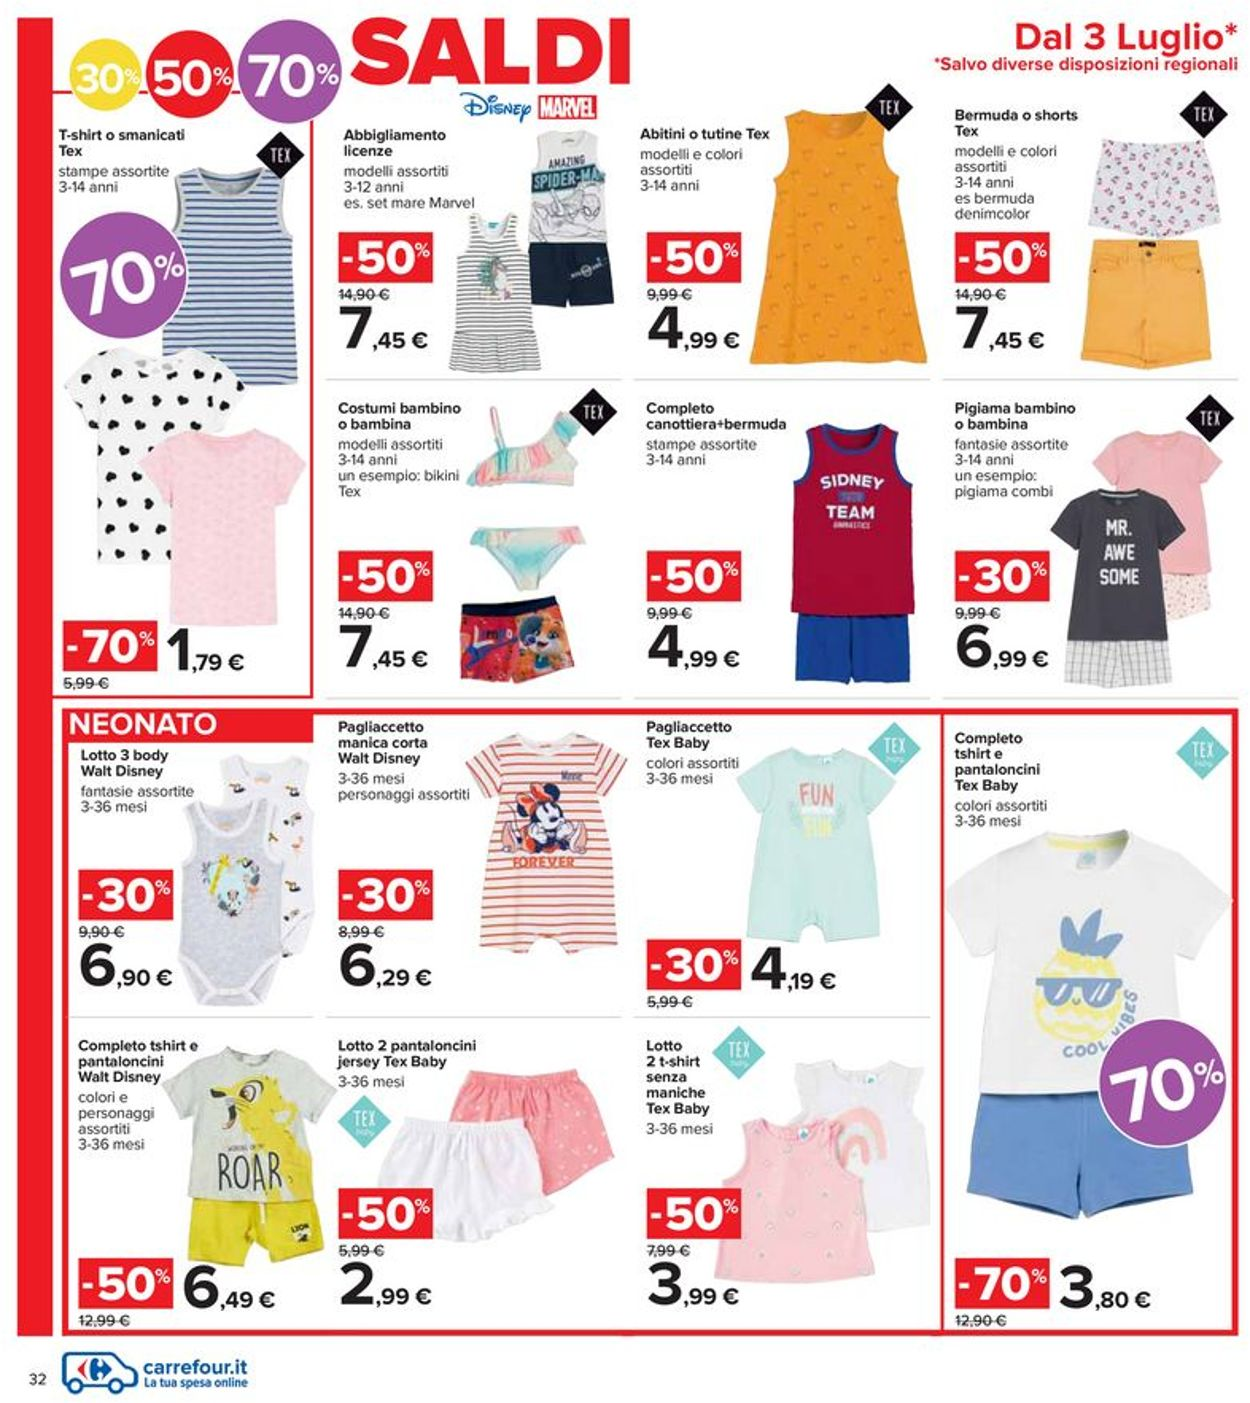 Volantino Carrefour - Offerte 01/07-14/07/2021 (Pagina 32)